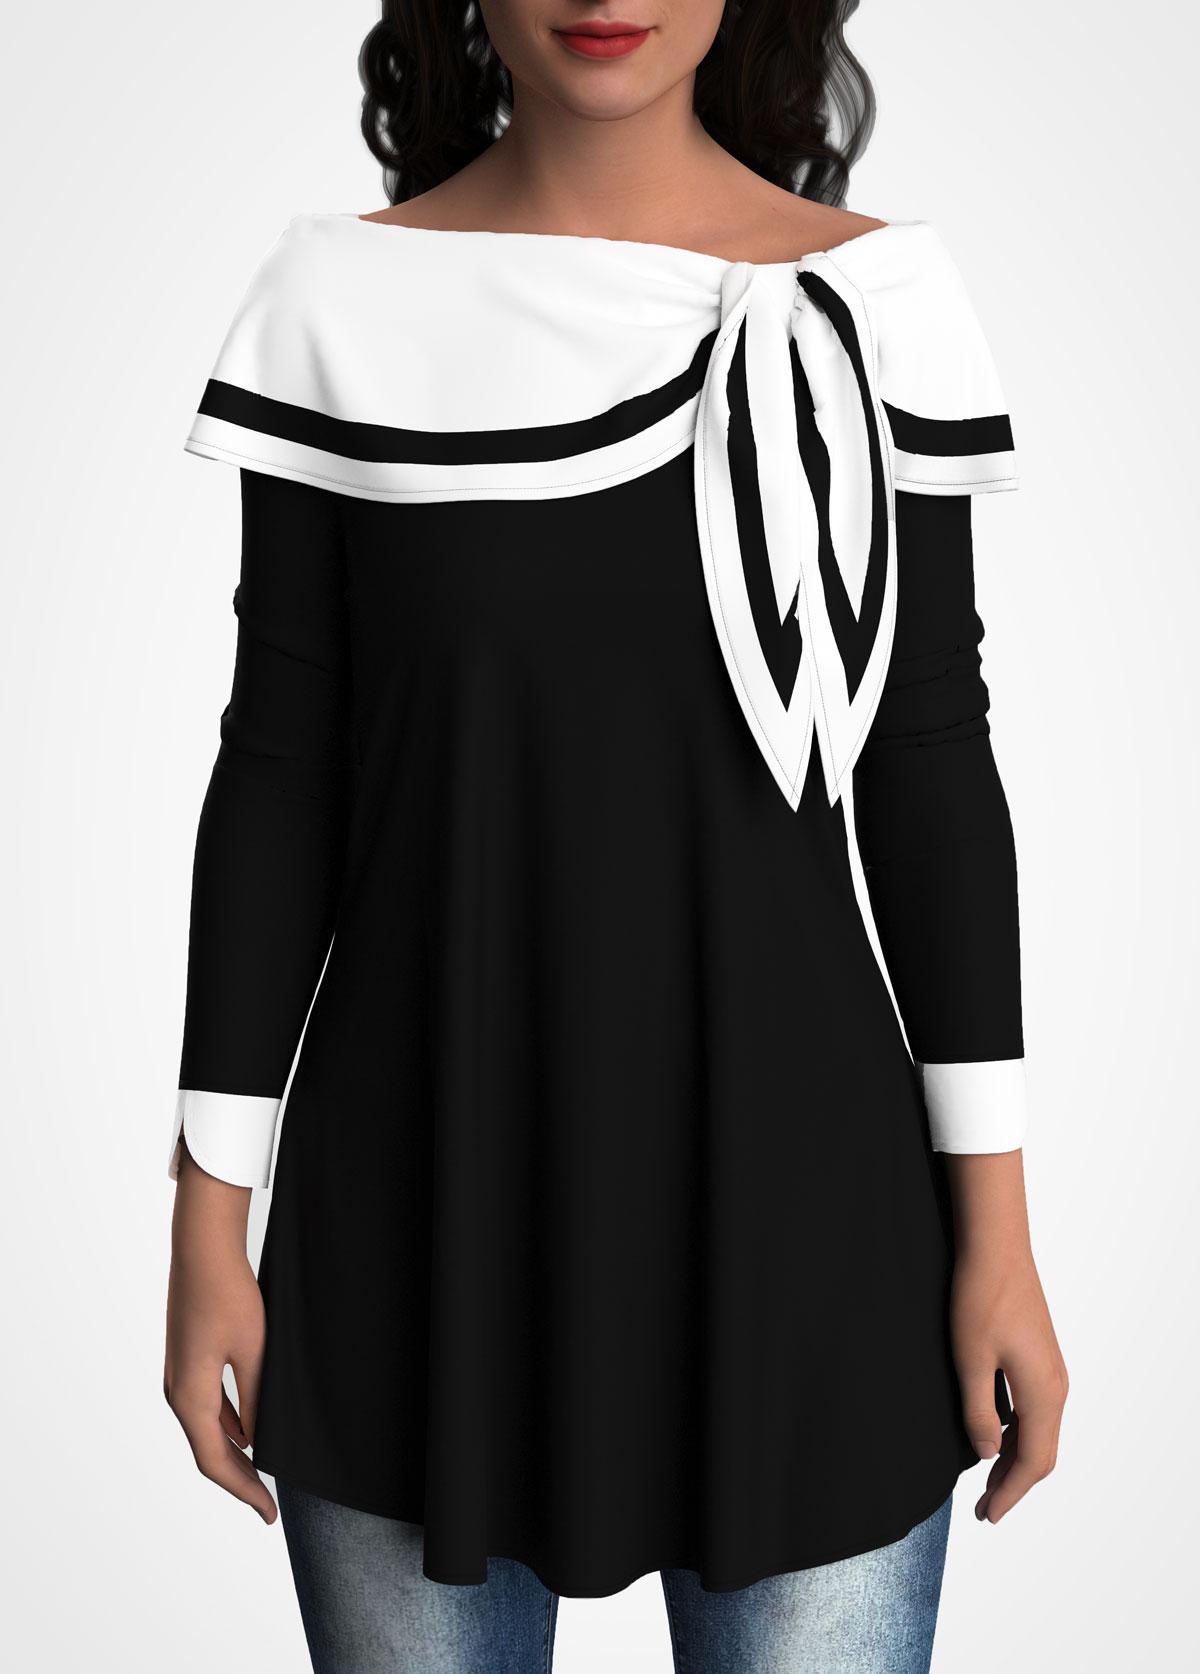 ROTITA Sailor Collar Tulip Sleeve Contrast Tunic Top